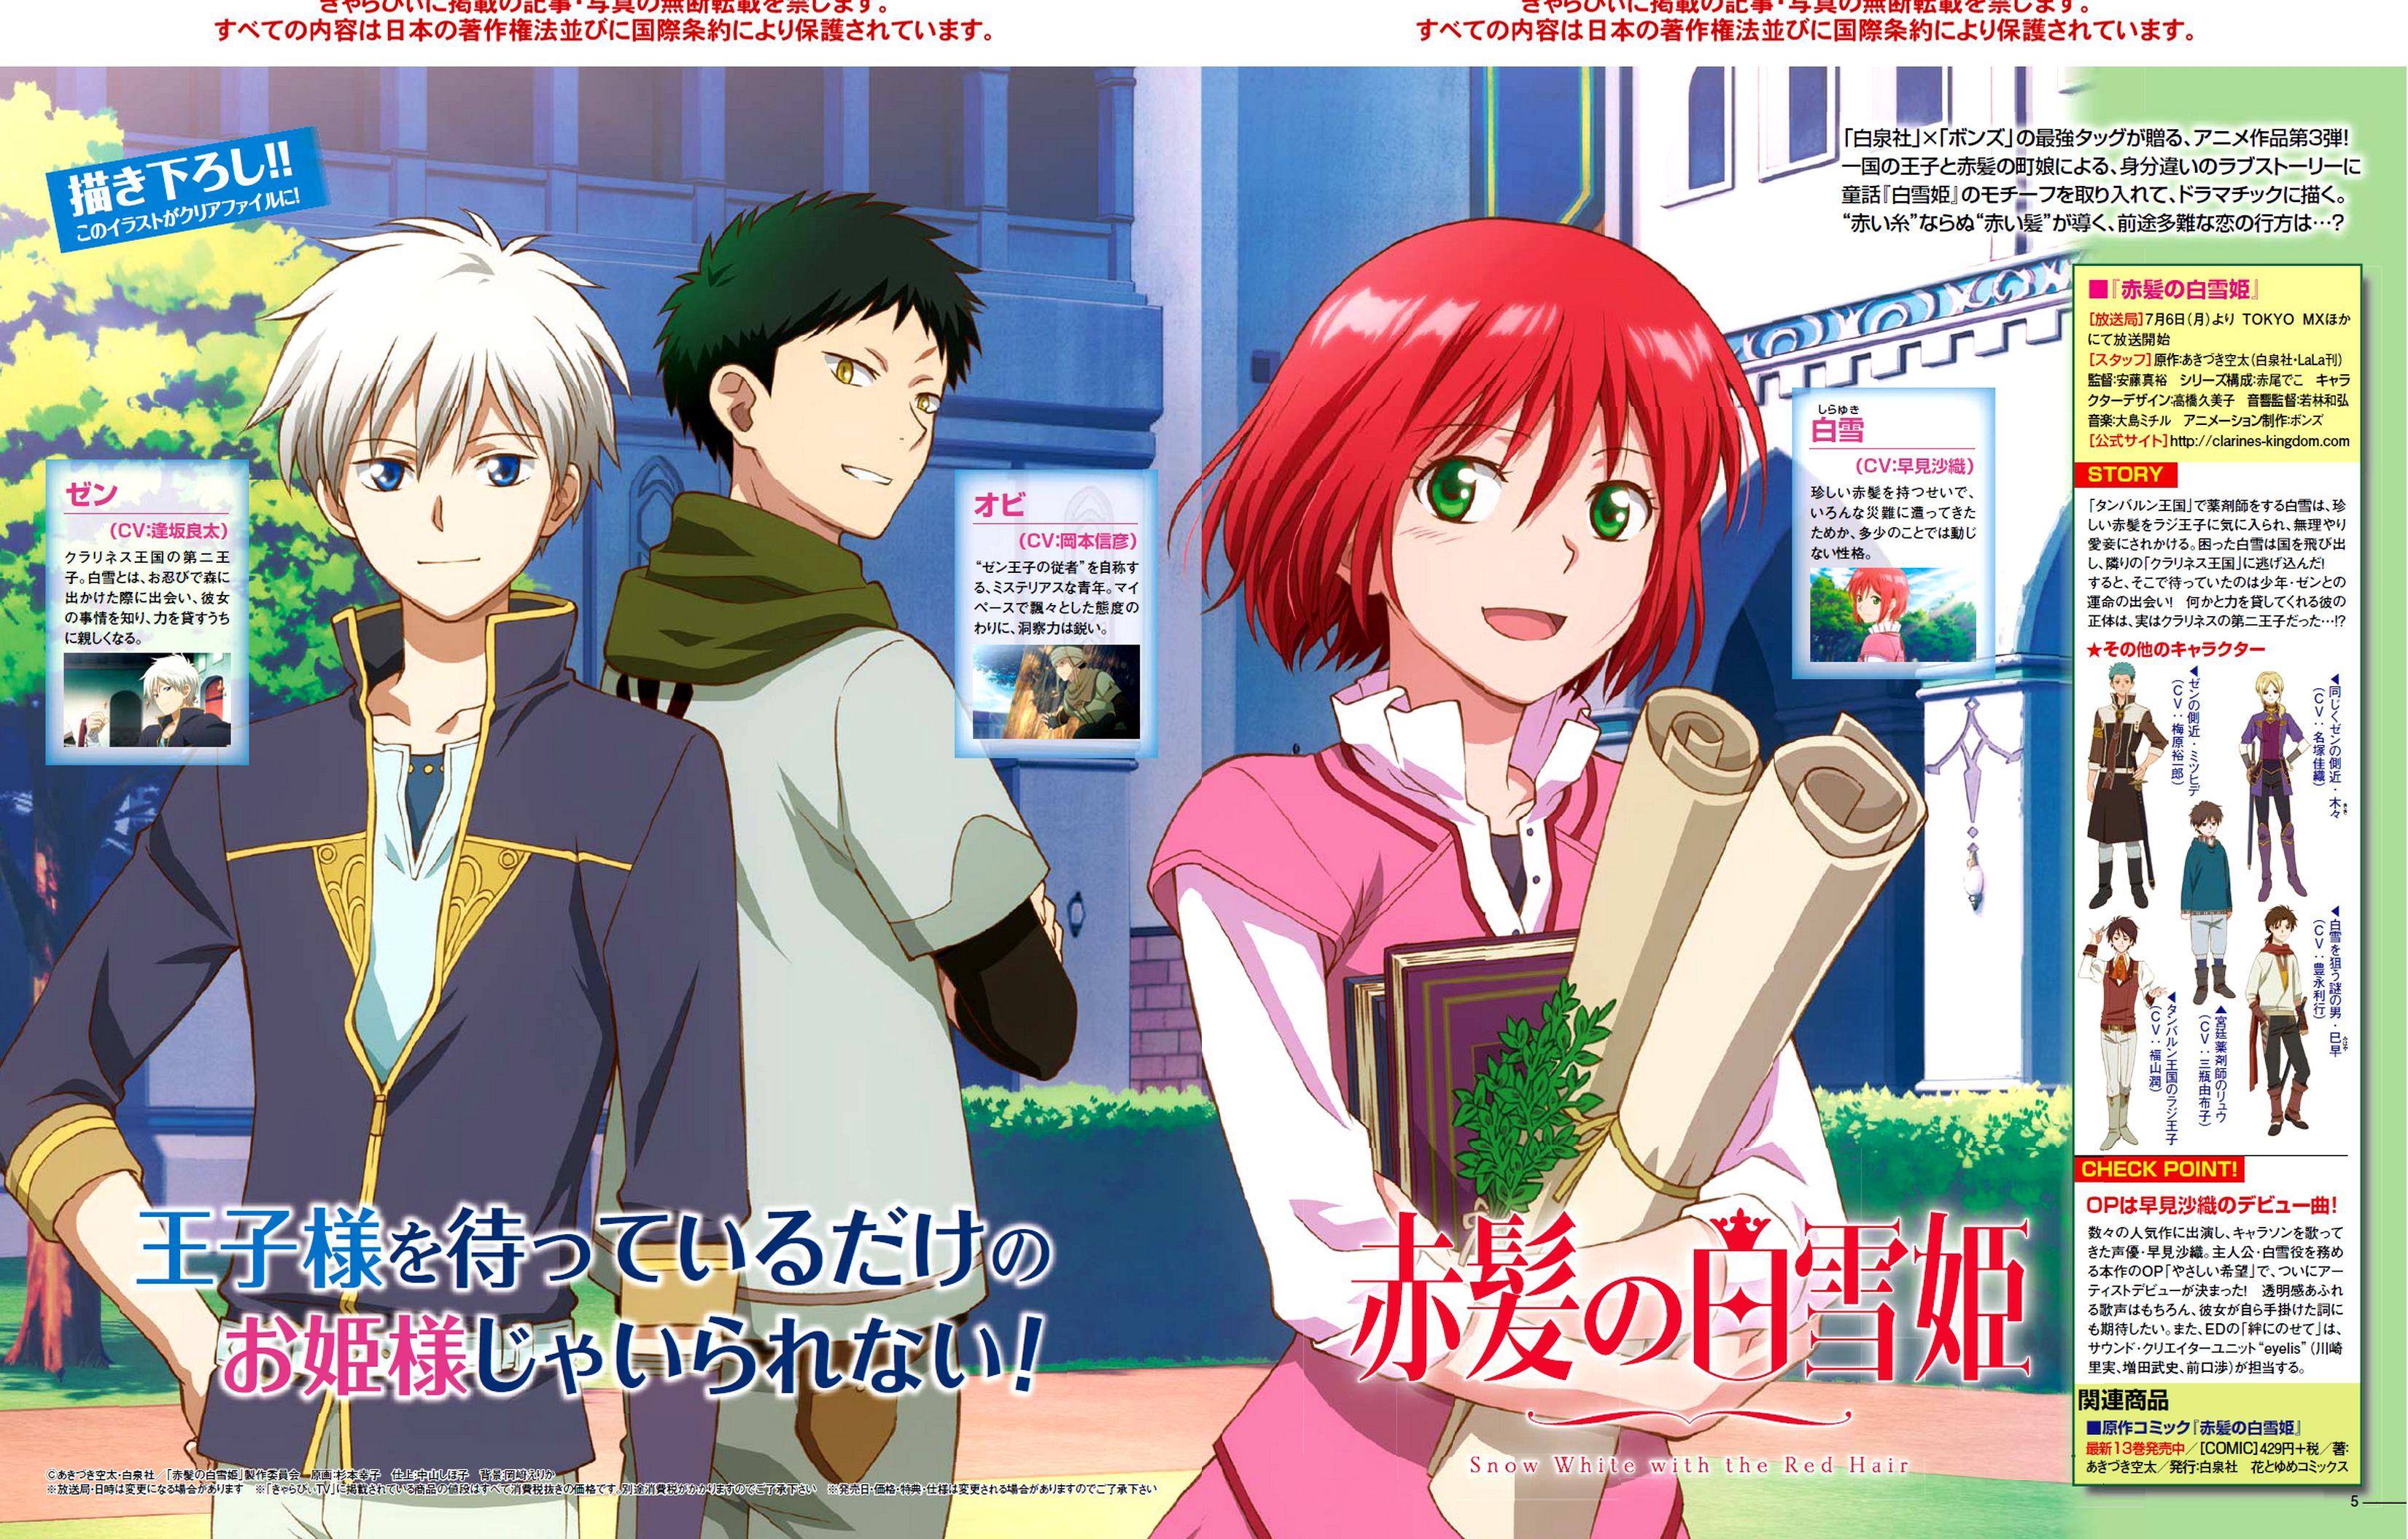 akagami_no_shirayuki_hime_wallpaper_hd_by_corphish2-d913fhg.jpg (3302×2111)